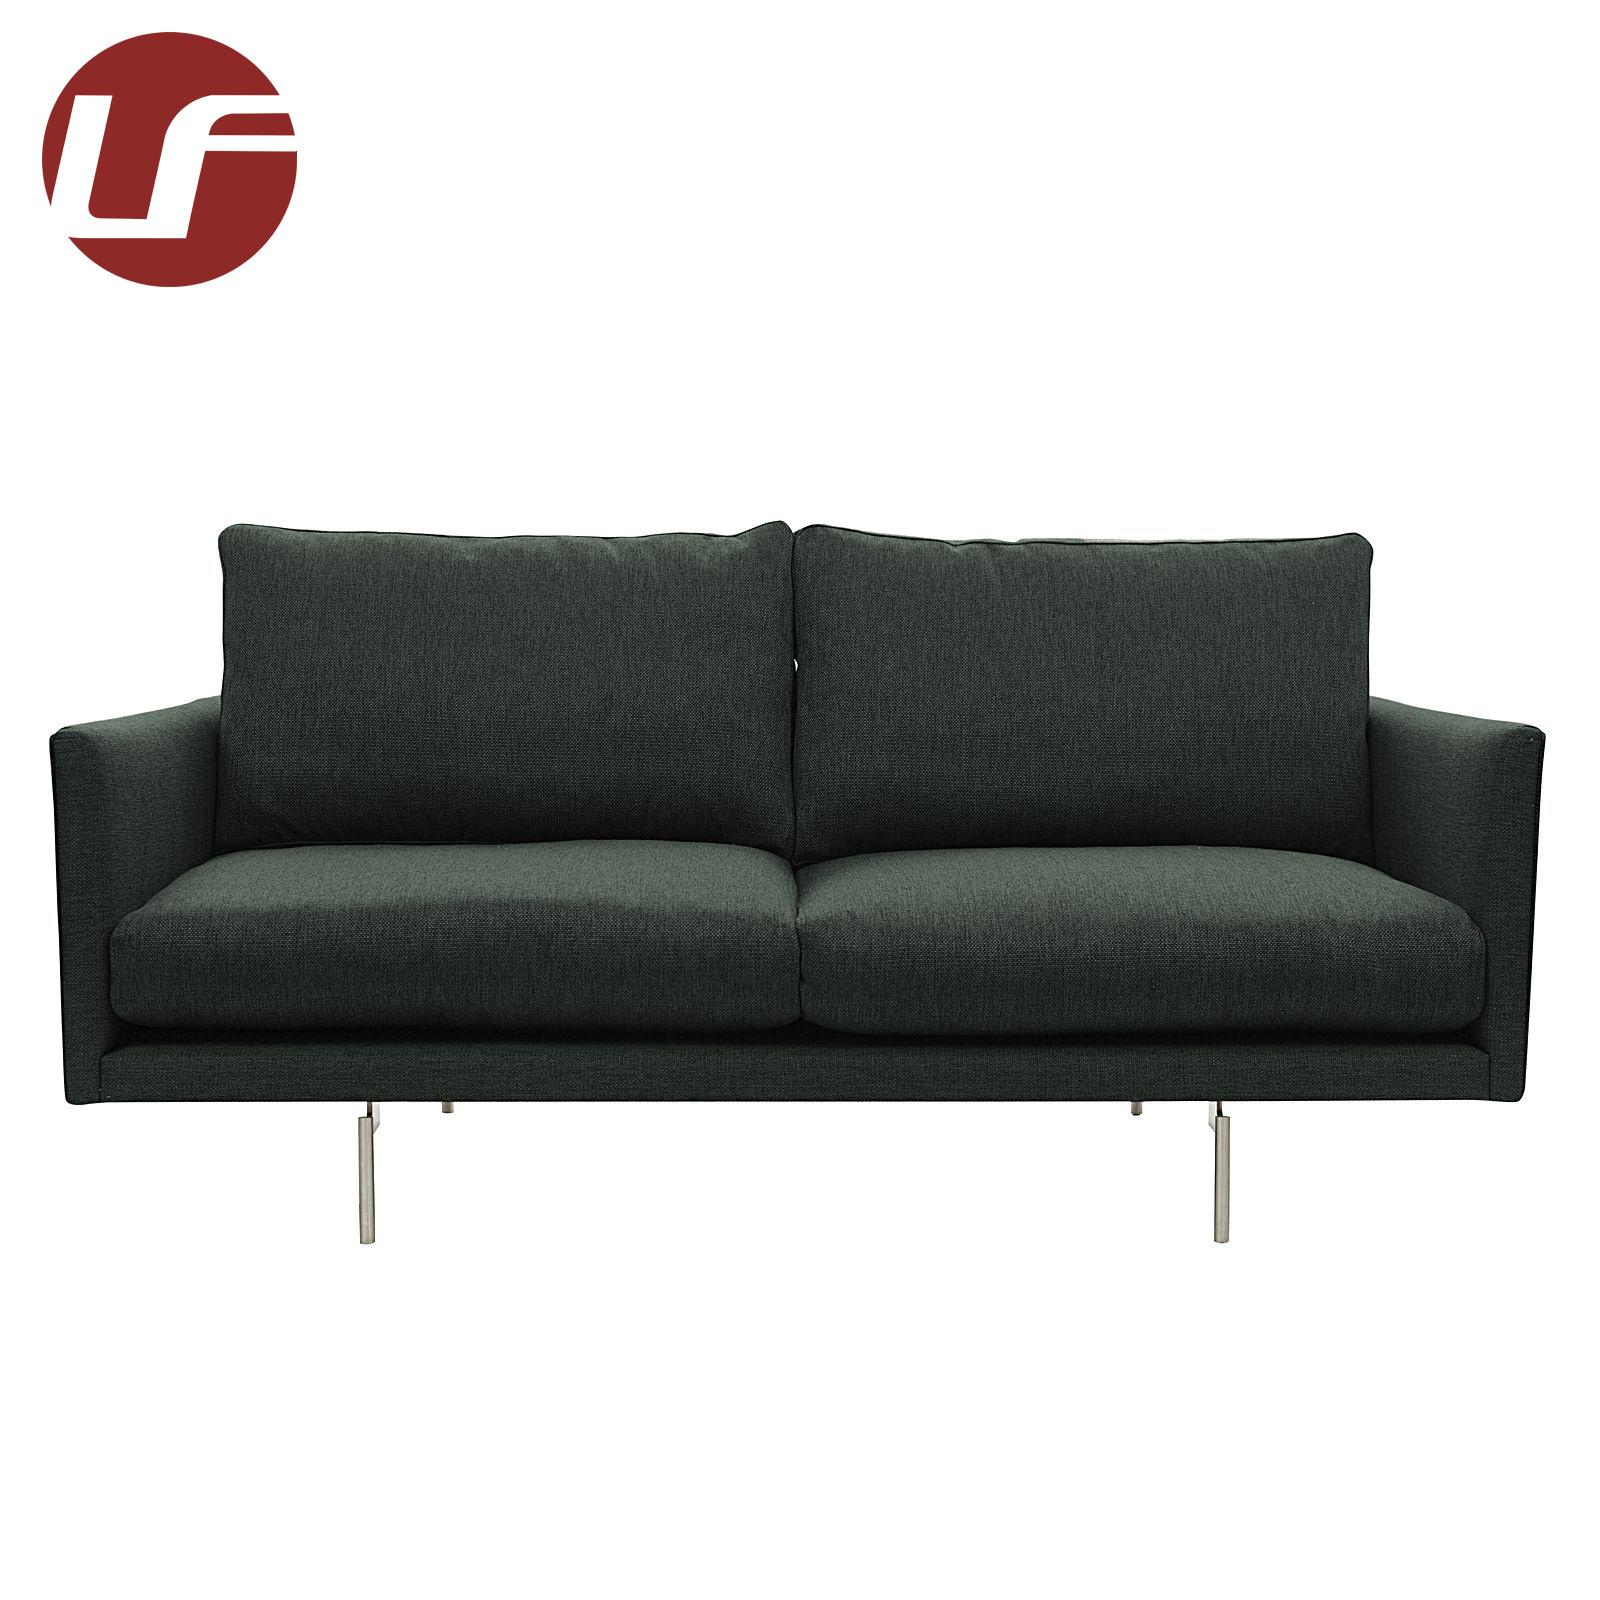 [Hot Item] Custom Contemporary Italian Fabric Sofa for Living Room Furniture